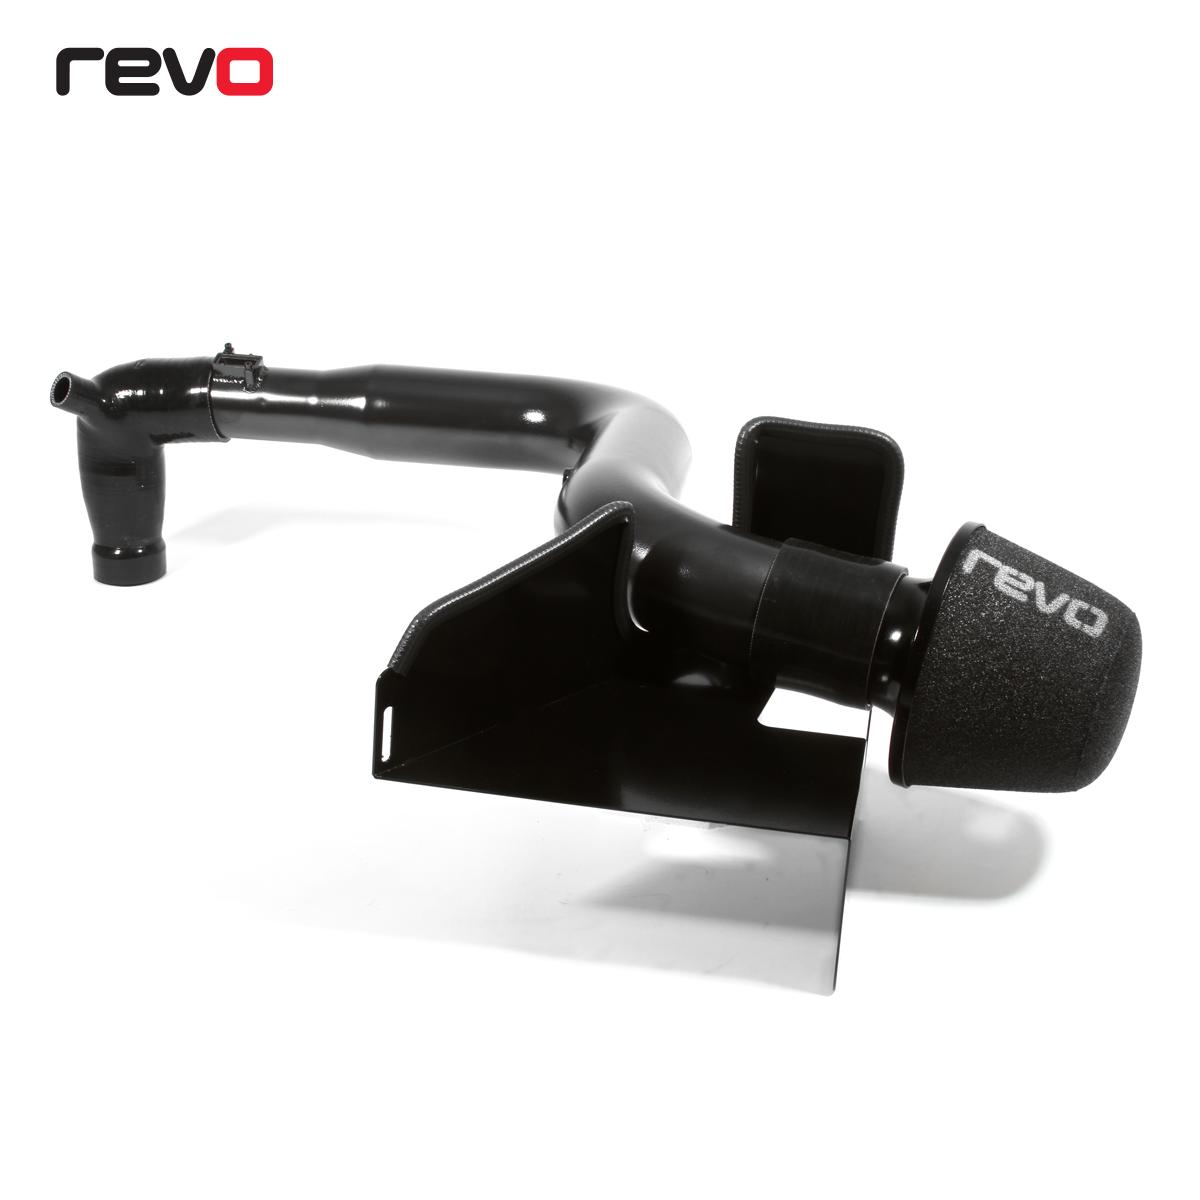 RT992M200200 full kit. Revo TFSI induction air filter kit for VW golf GTI, MK5, Audi S3, SEAT Leon.